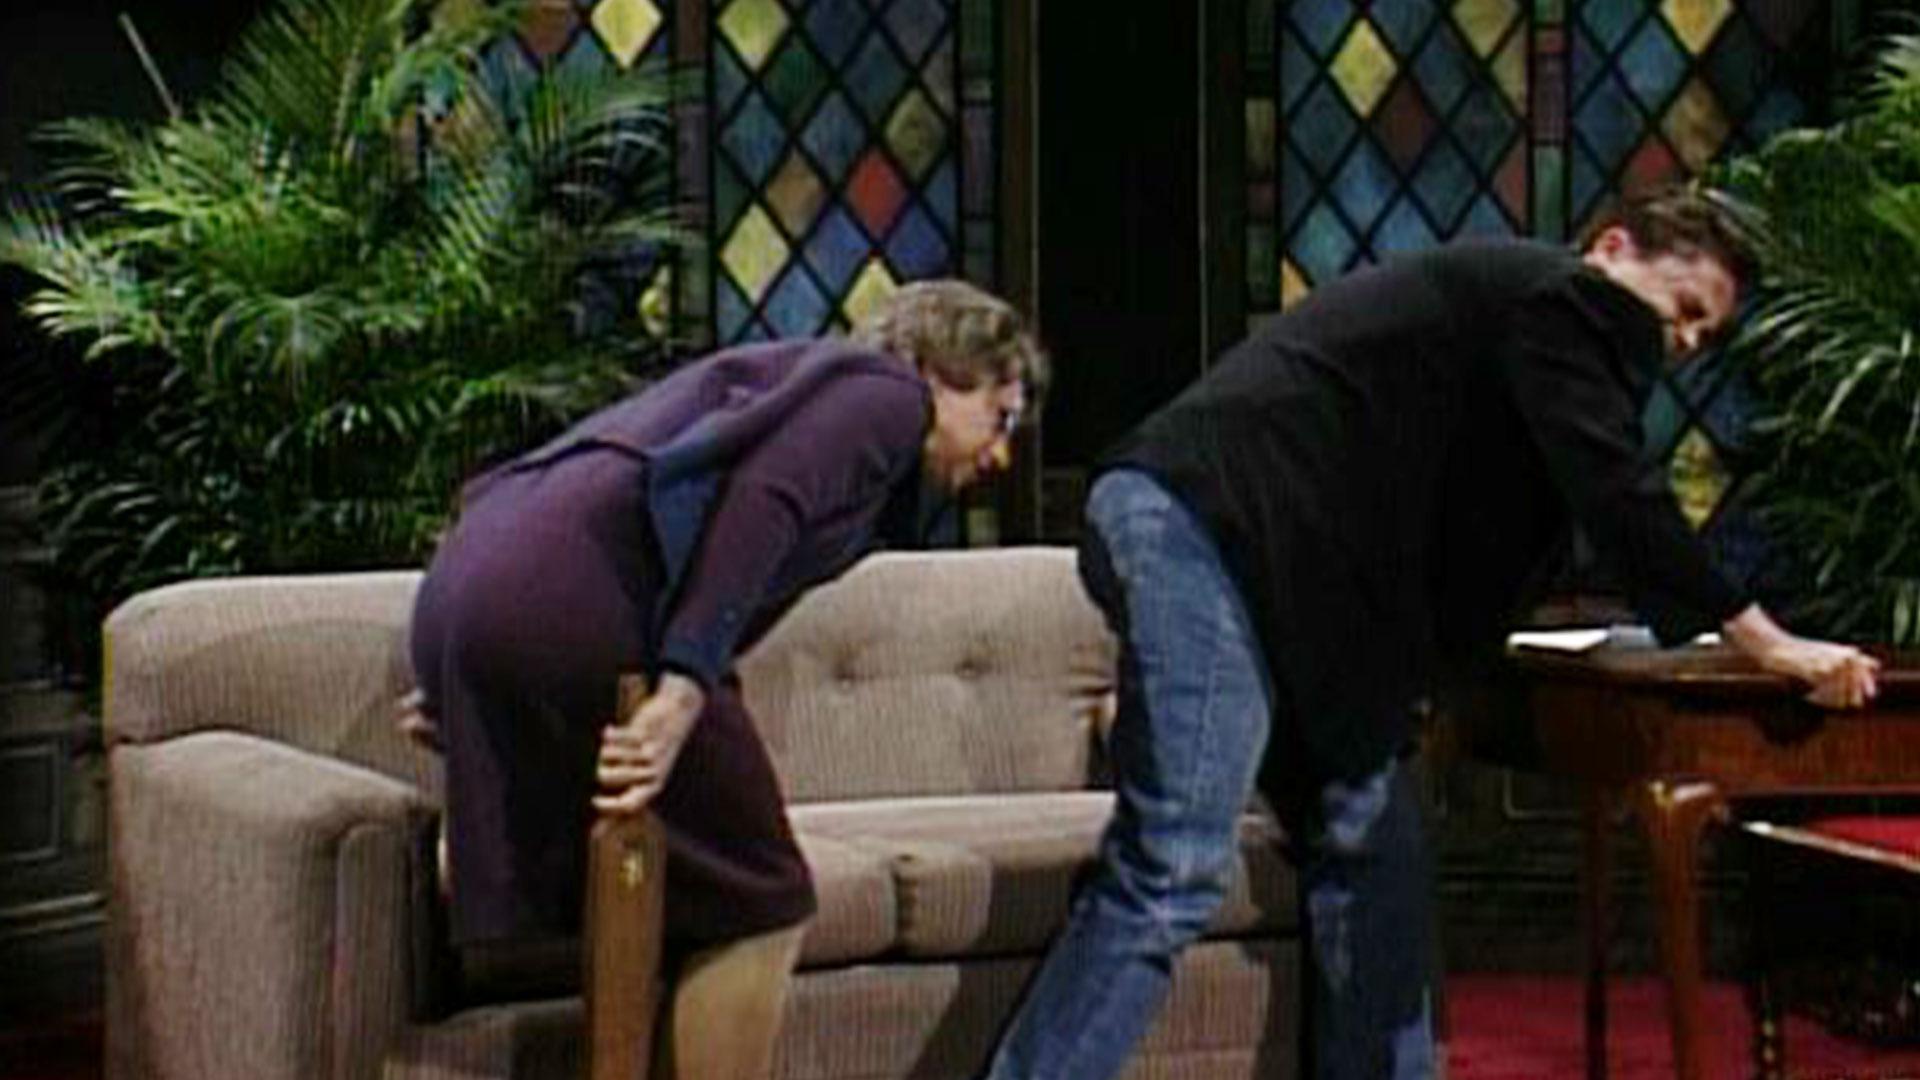 Watch Church Chat Rob Lowe From Saturday Night Live Nbc Com